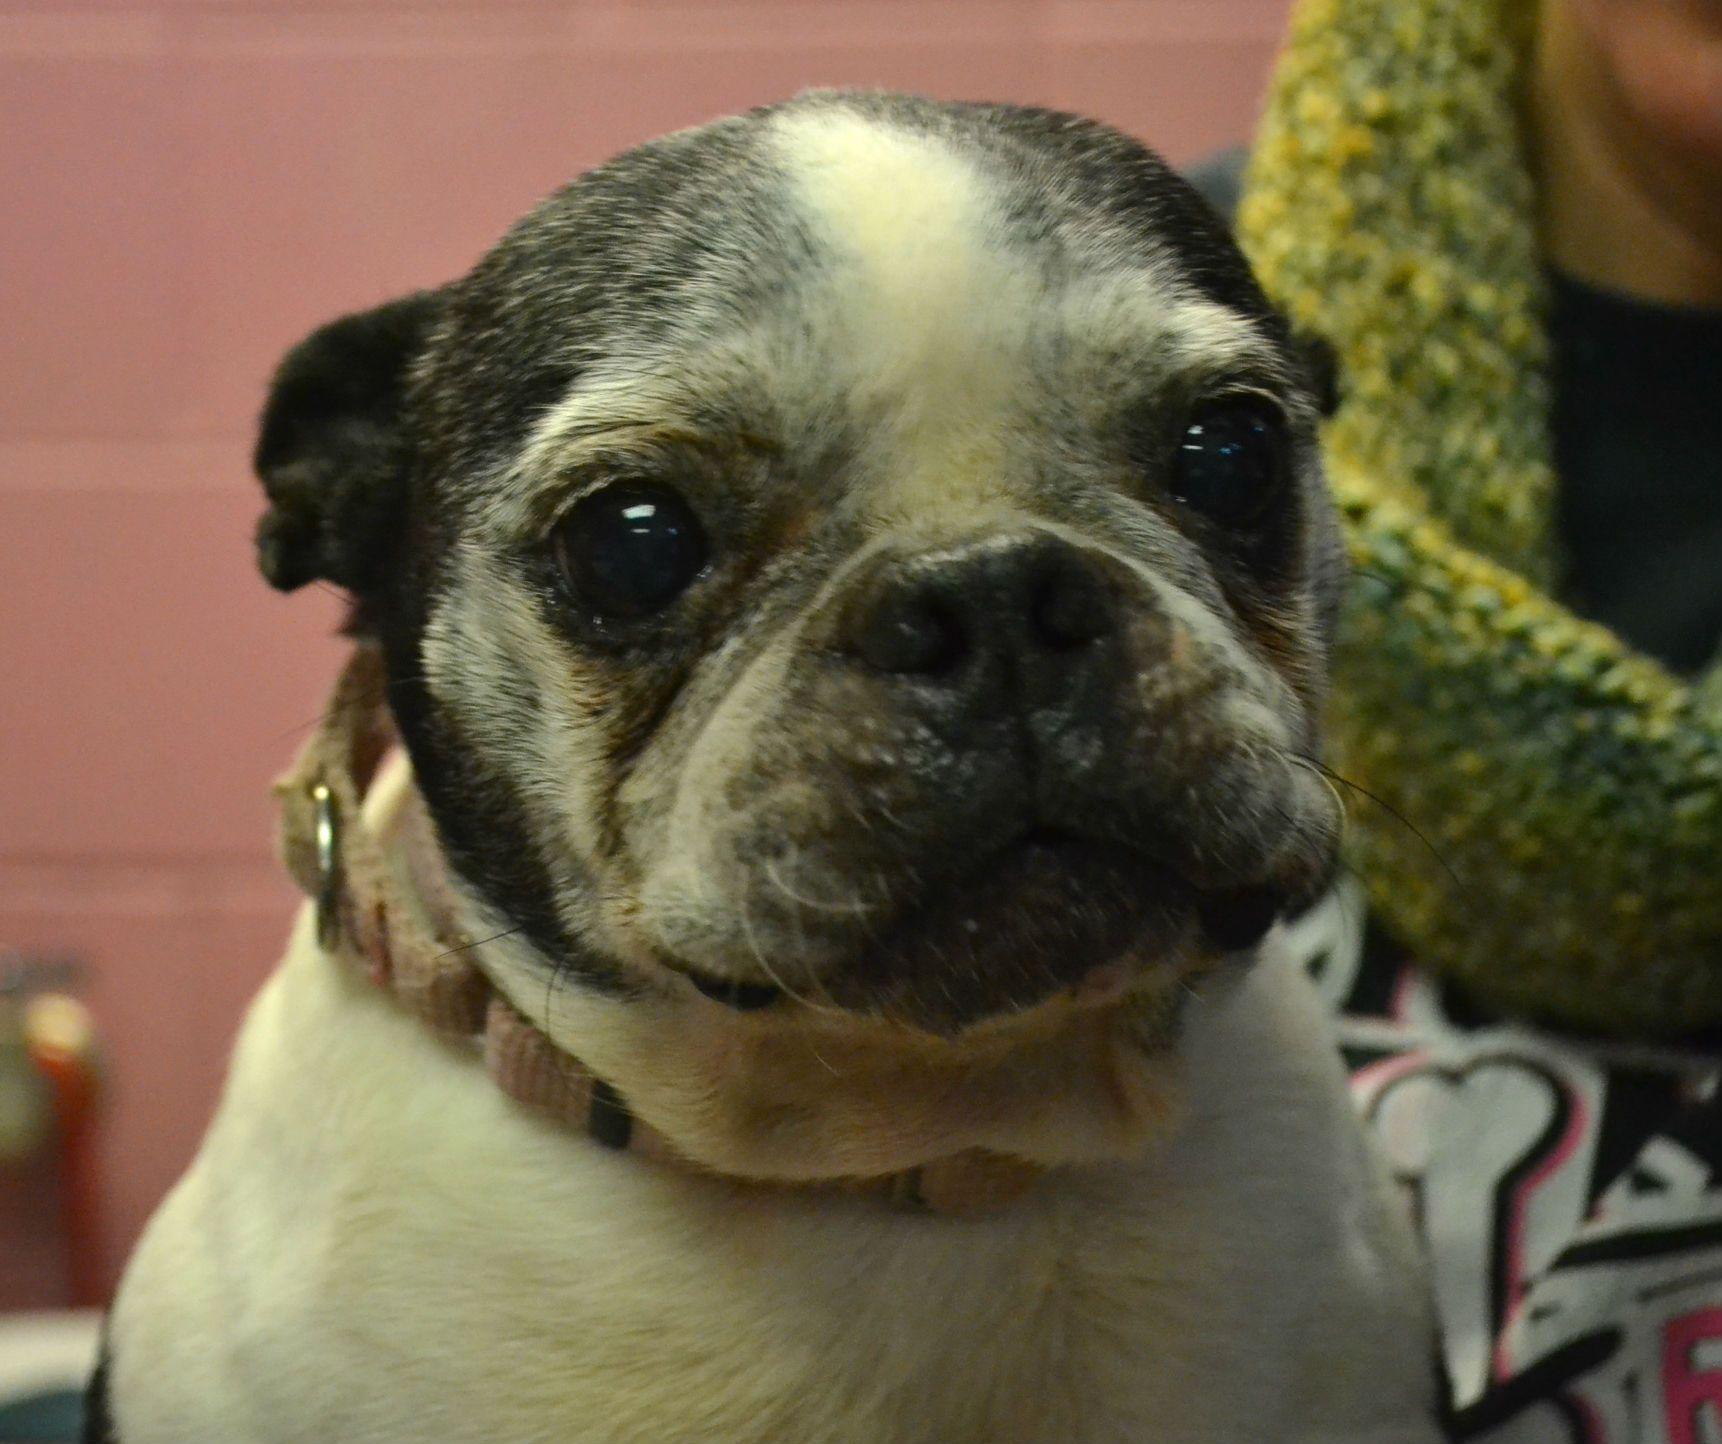 Boston Terrier dog for Adoption in Akron, OH. ADN443910